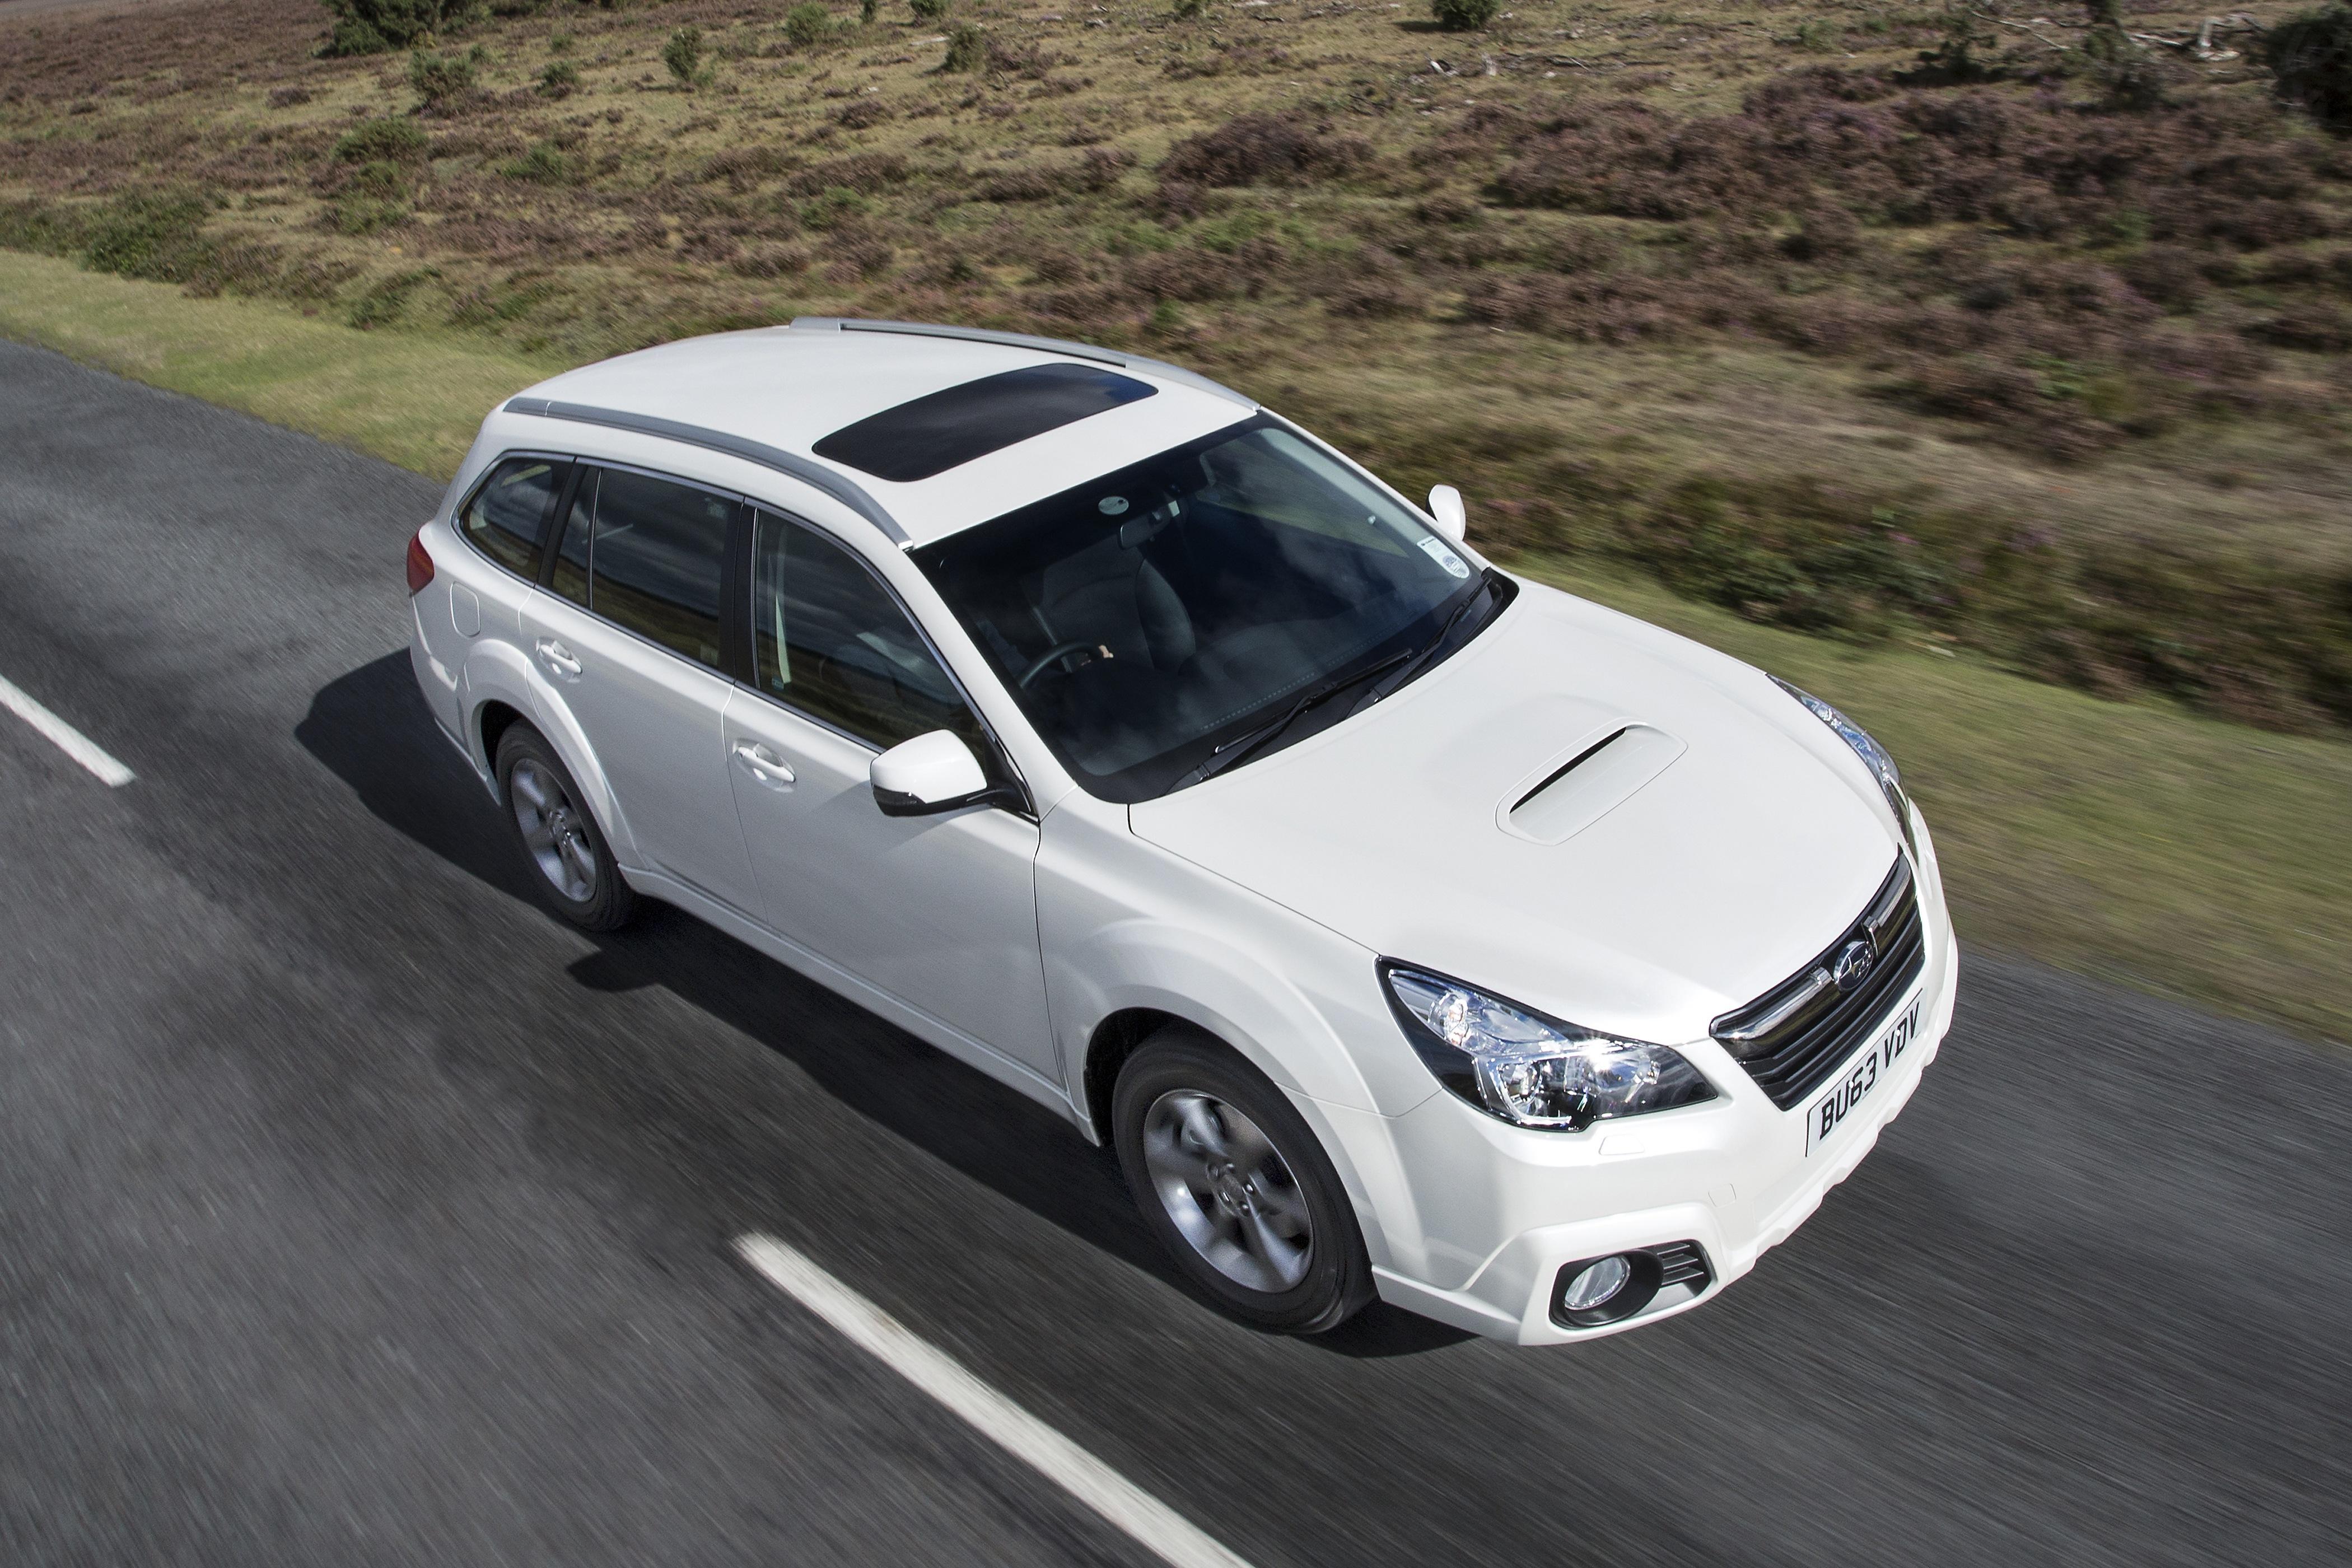 Wallpaper Subaru 2015 Sedan netcarshow netcar car images car